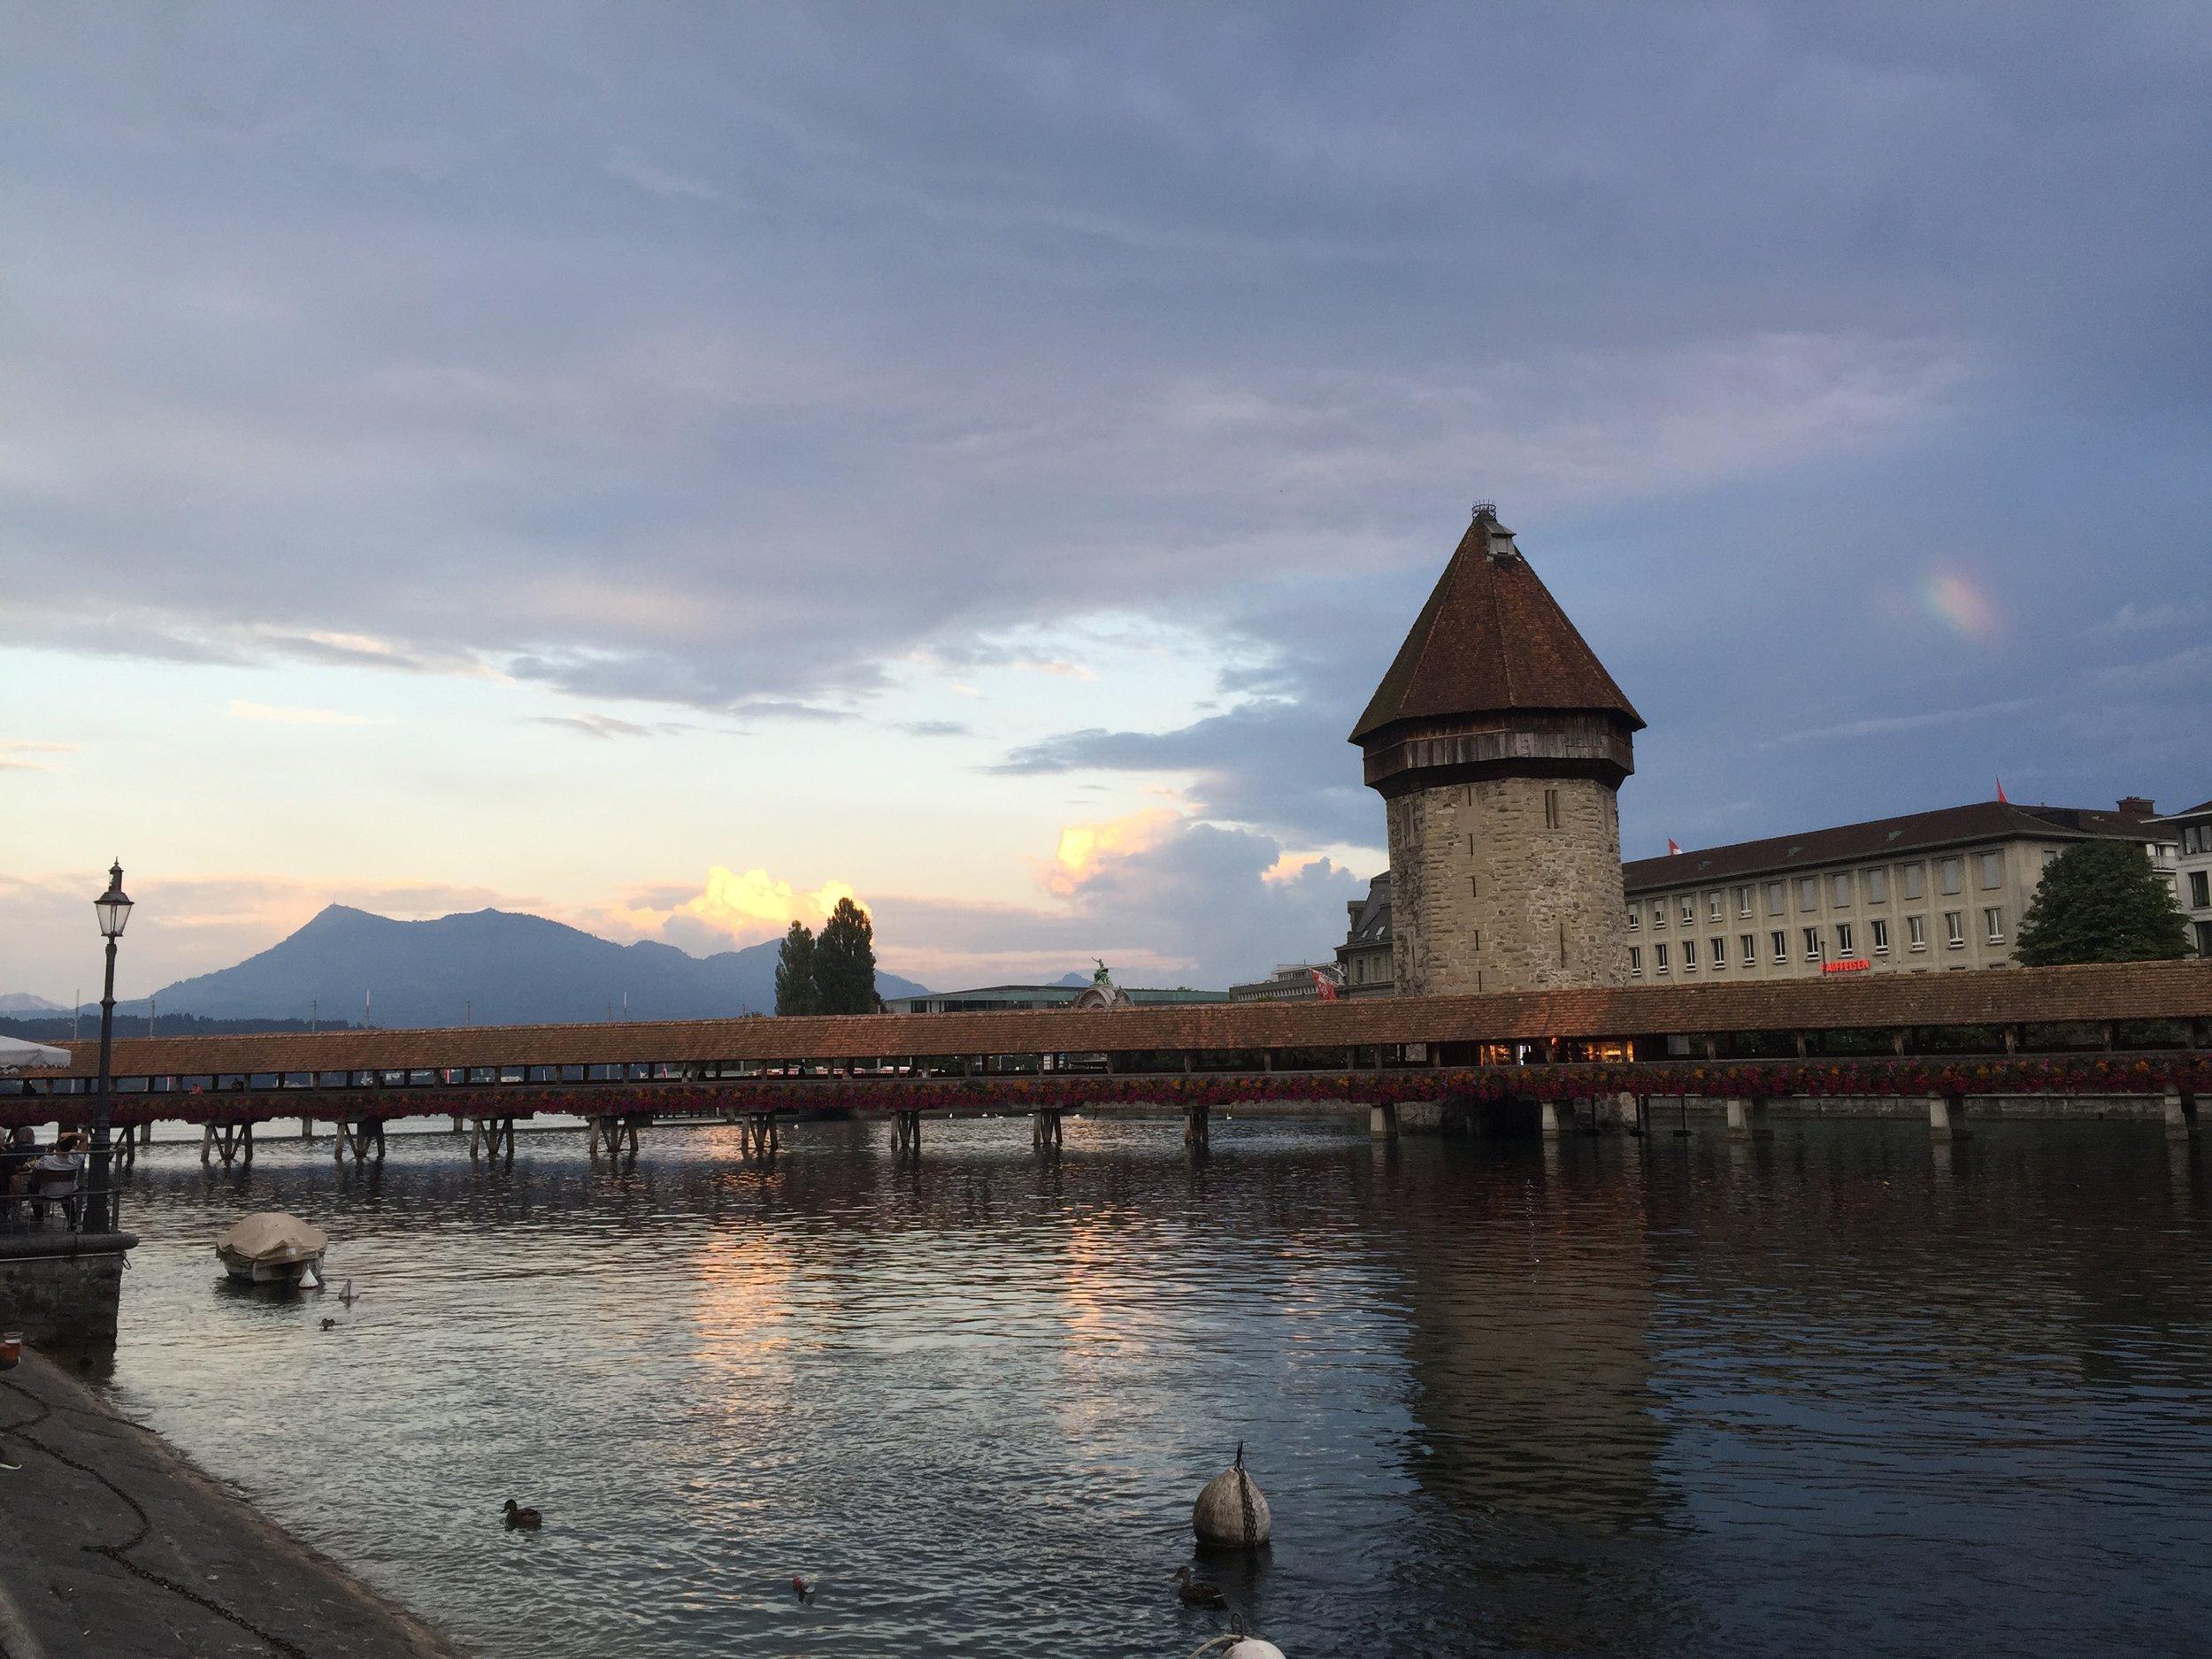 One of Lucerne's famous bridges at sunset